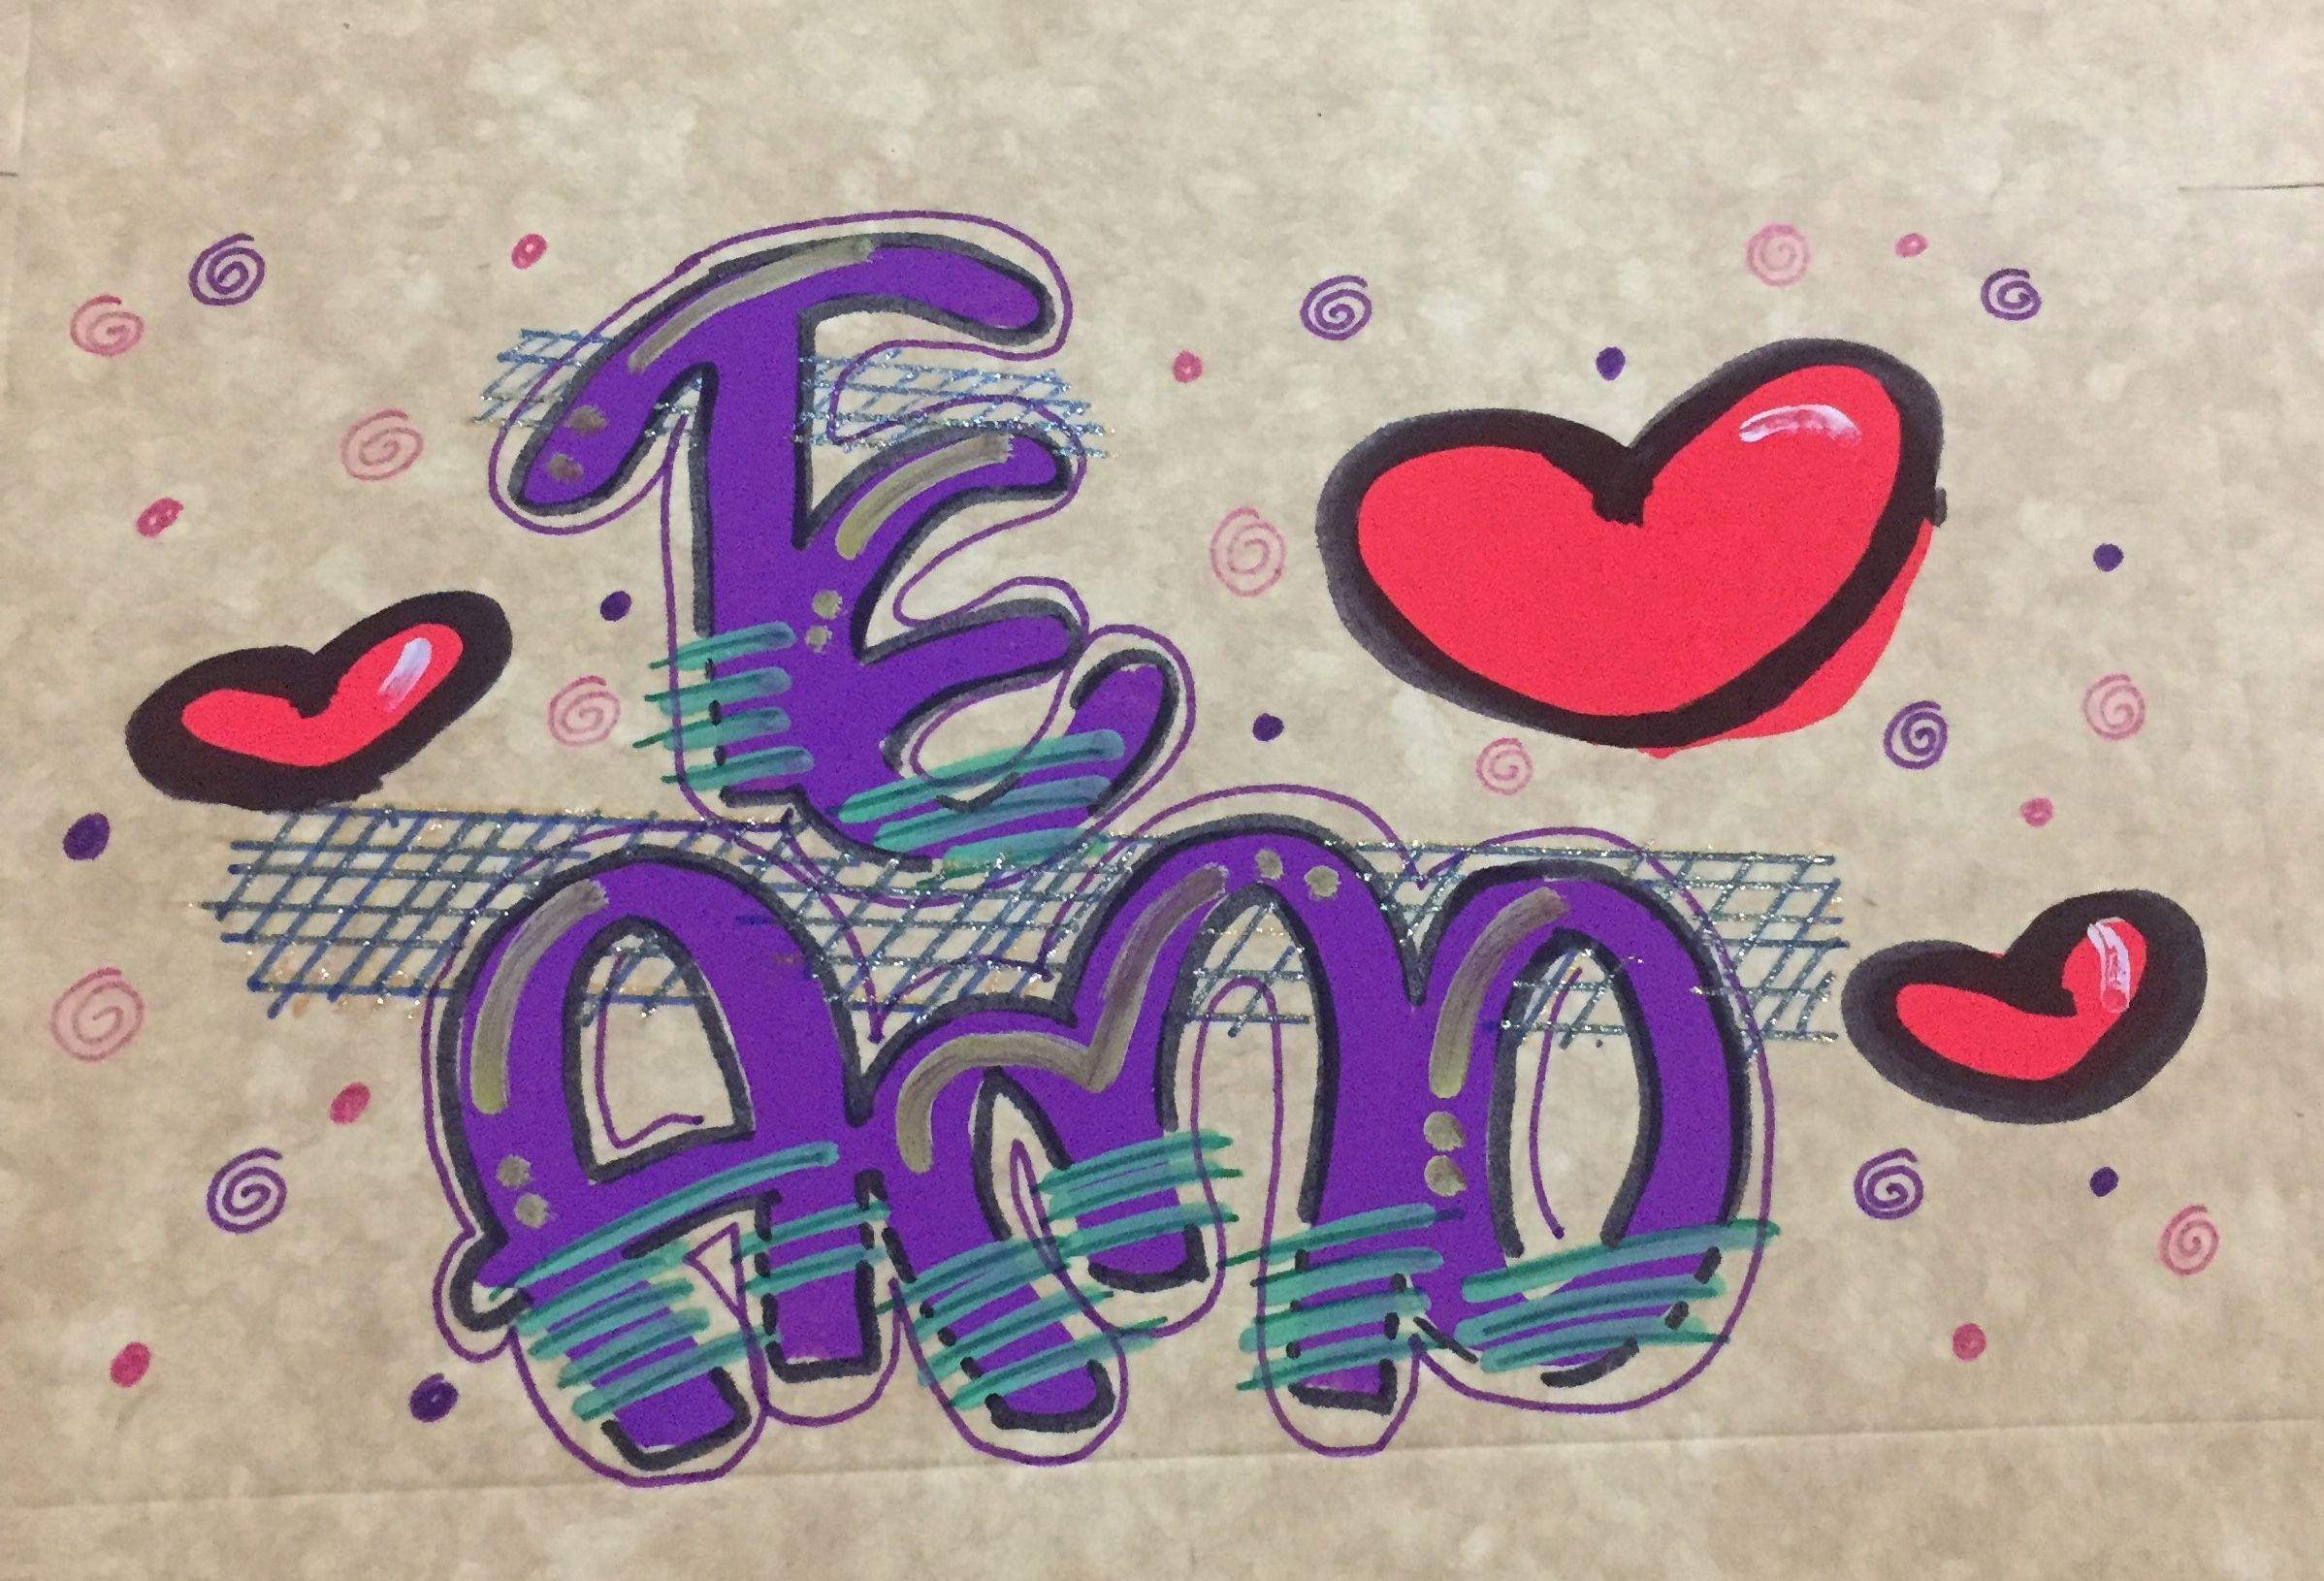 Pin de Sol Angela Muñoz en Nombres Letra Timoteo   Como hacer letra timoteo,  Carta de amor manualidades, Tarjetas timoteo a mano